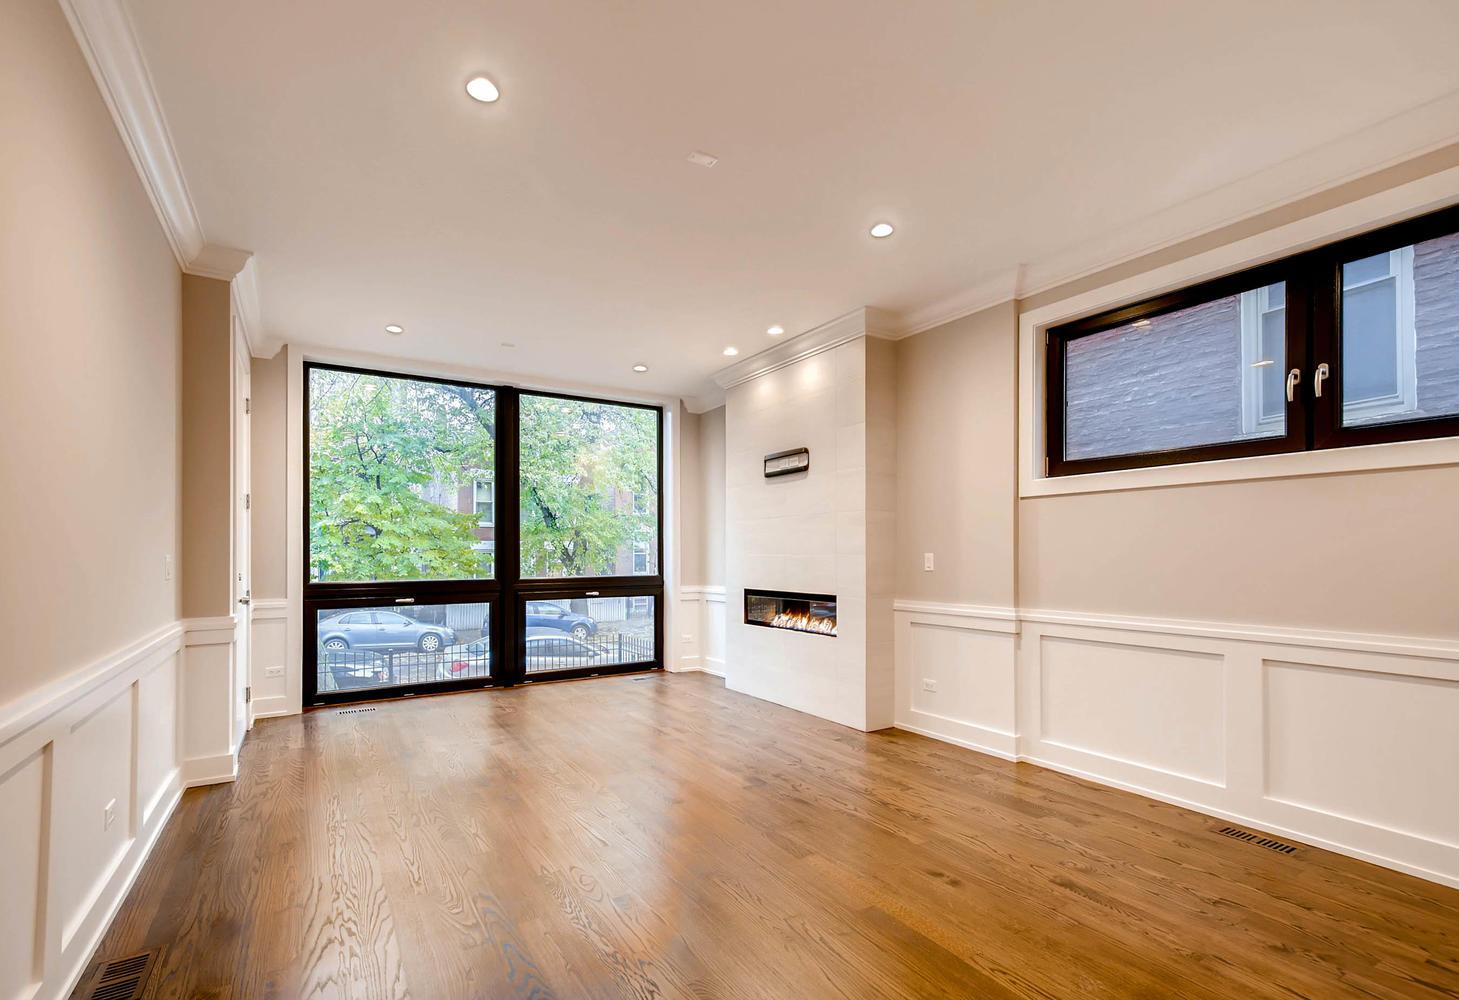 877 N HERMITAGE AVE UNIT 1-large-002-10-Living Room-1460x1000-72dpi.jpg